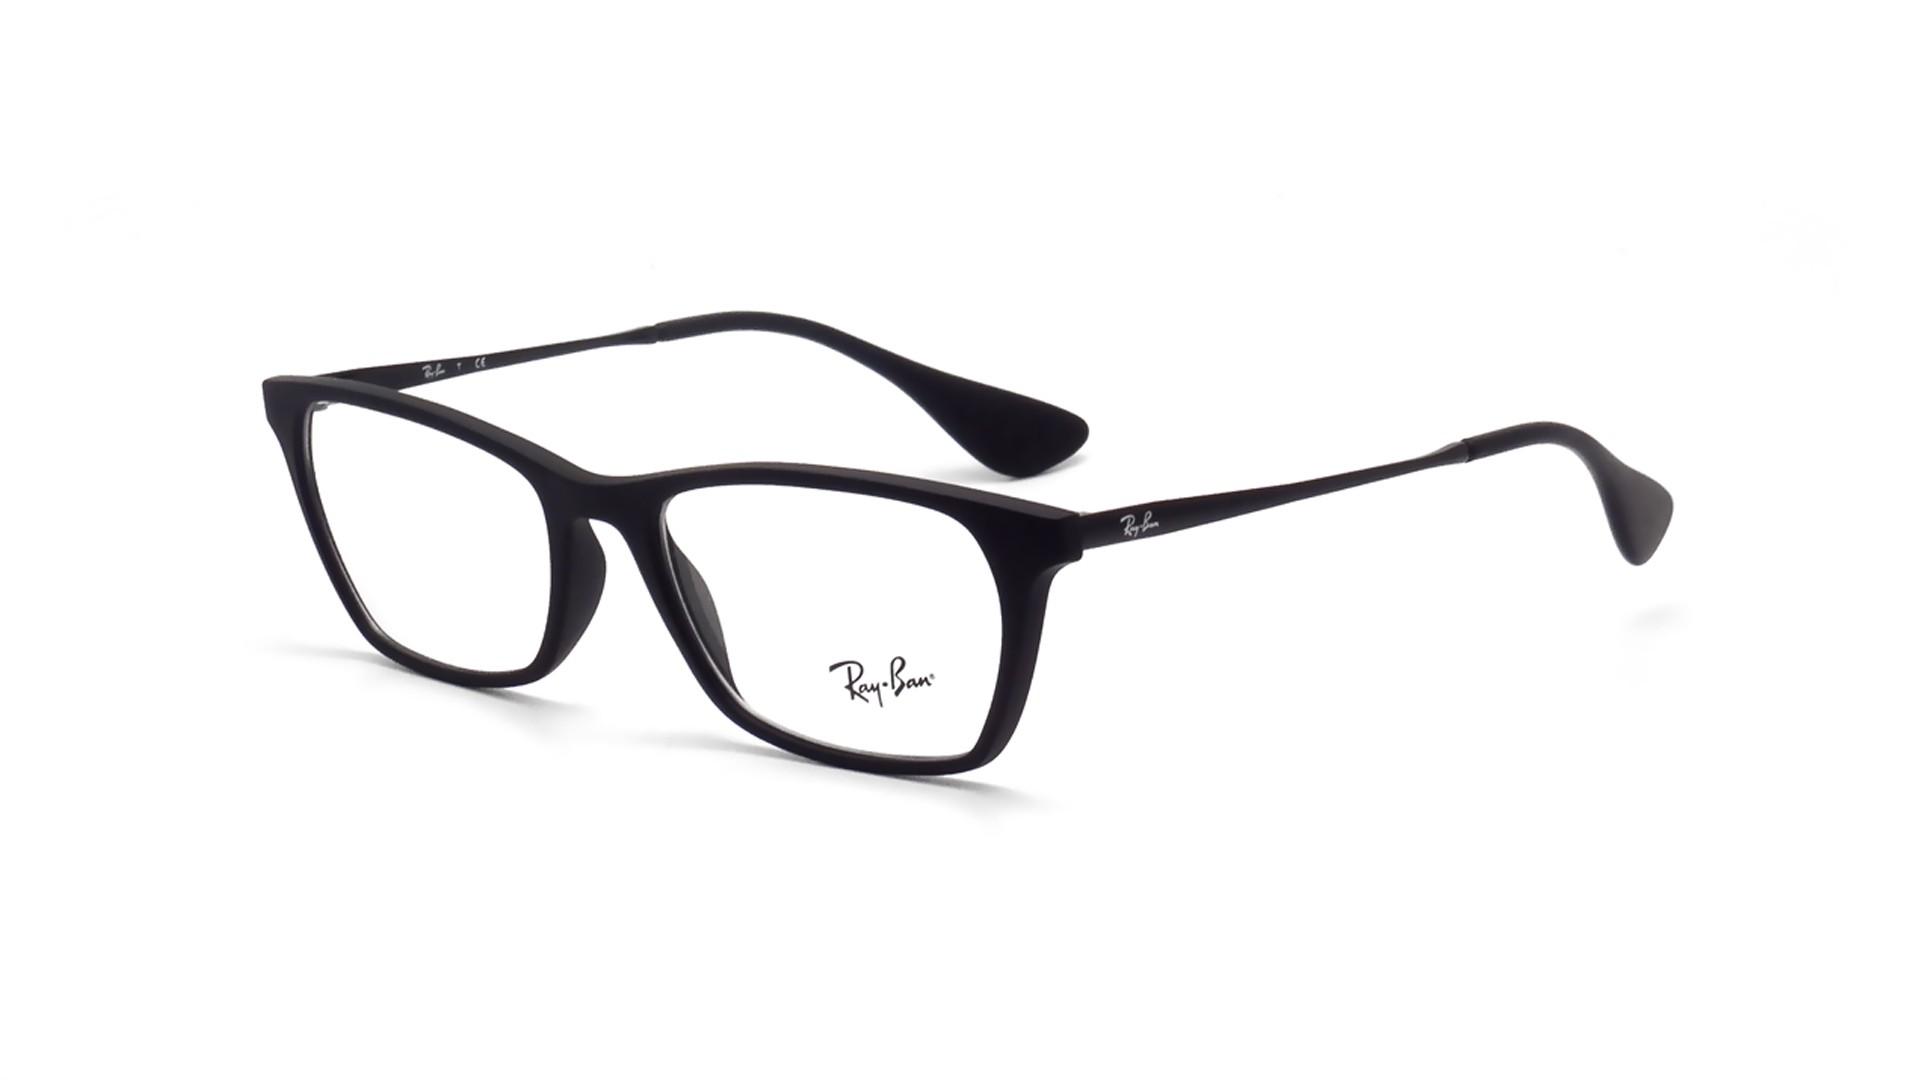 ebe9c3a9f6 sale ray ban clubmaster eyeglasses matte black b0143 c99f5